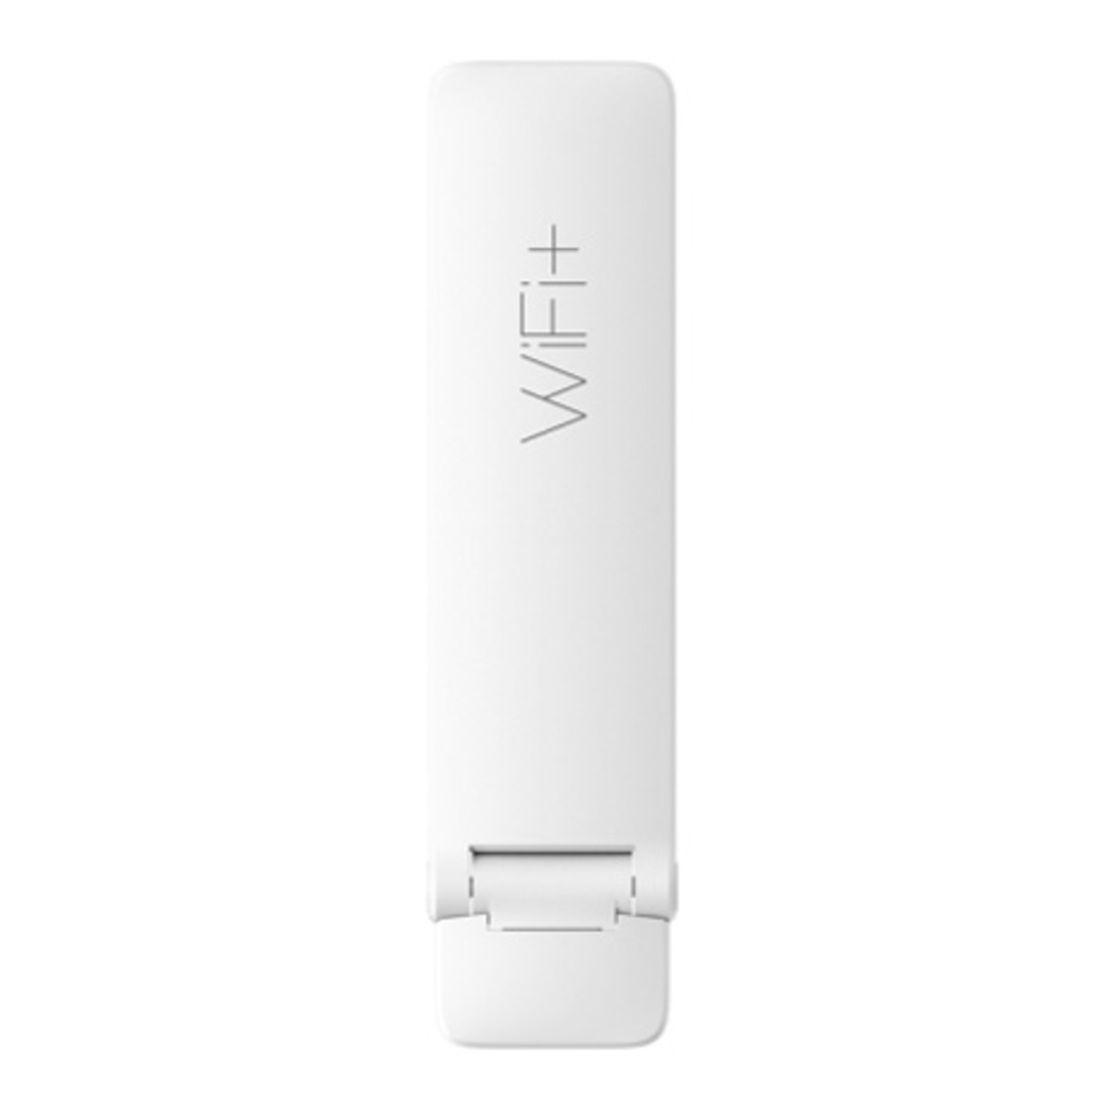 Repetidor de Sinal Mi WiFi 2  - Branco  - PAGDEPOIS